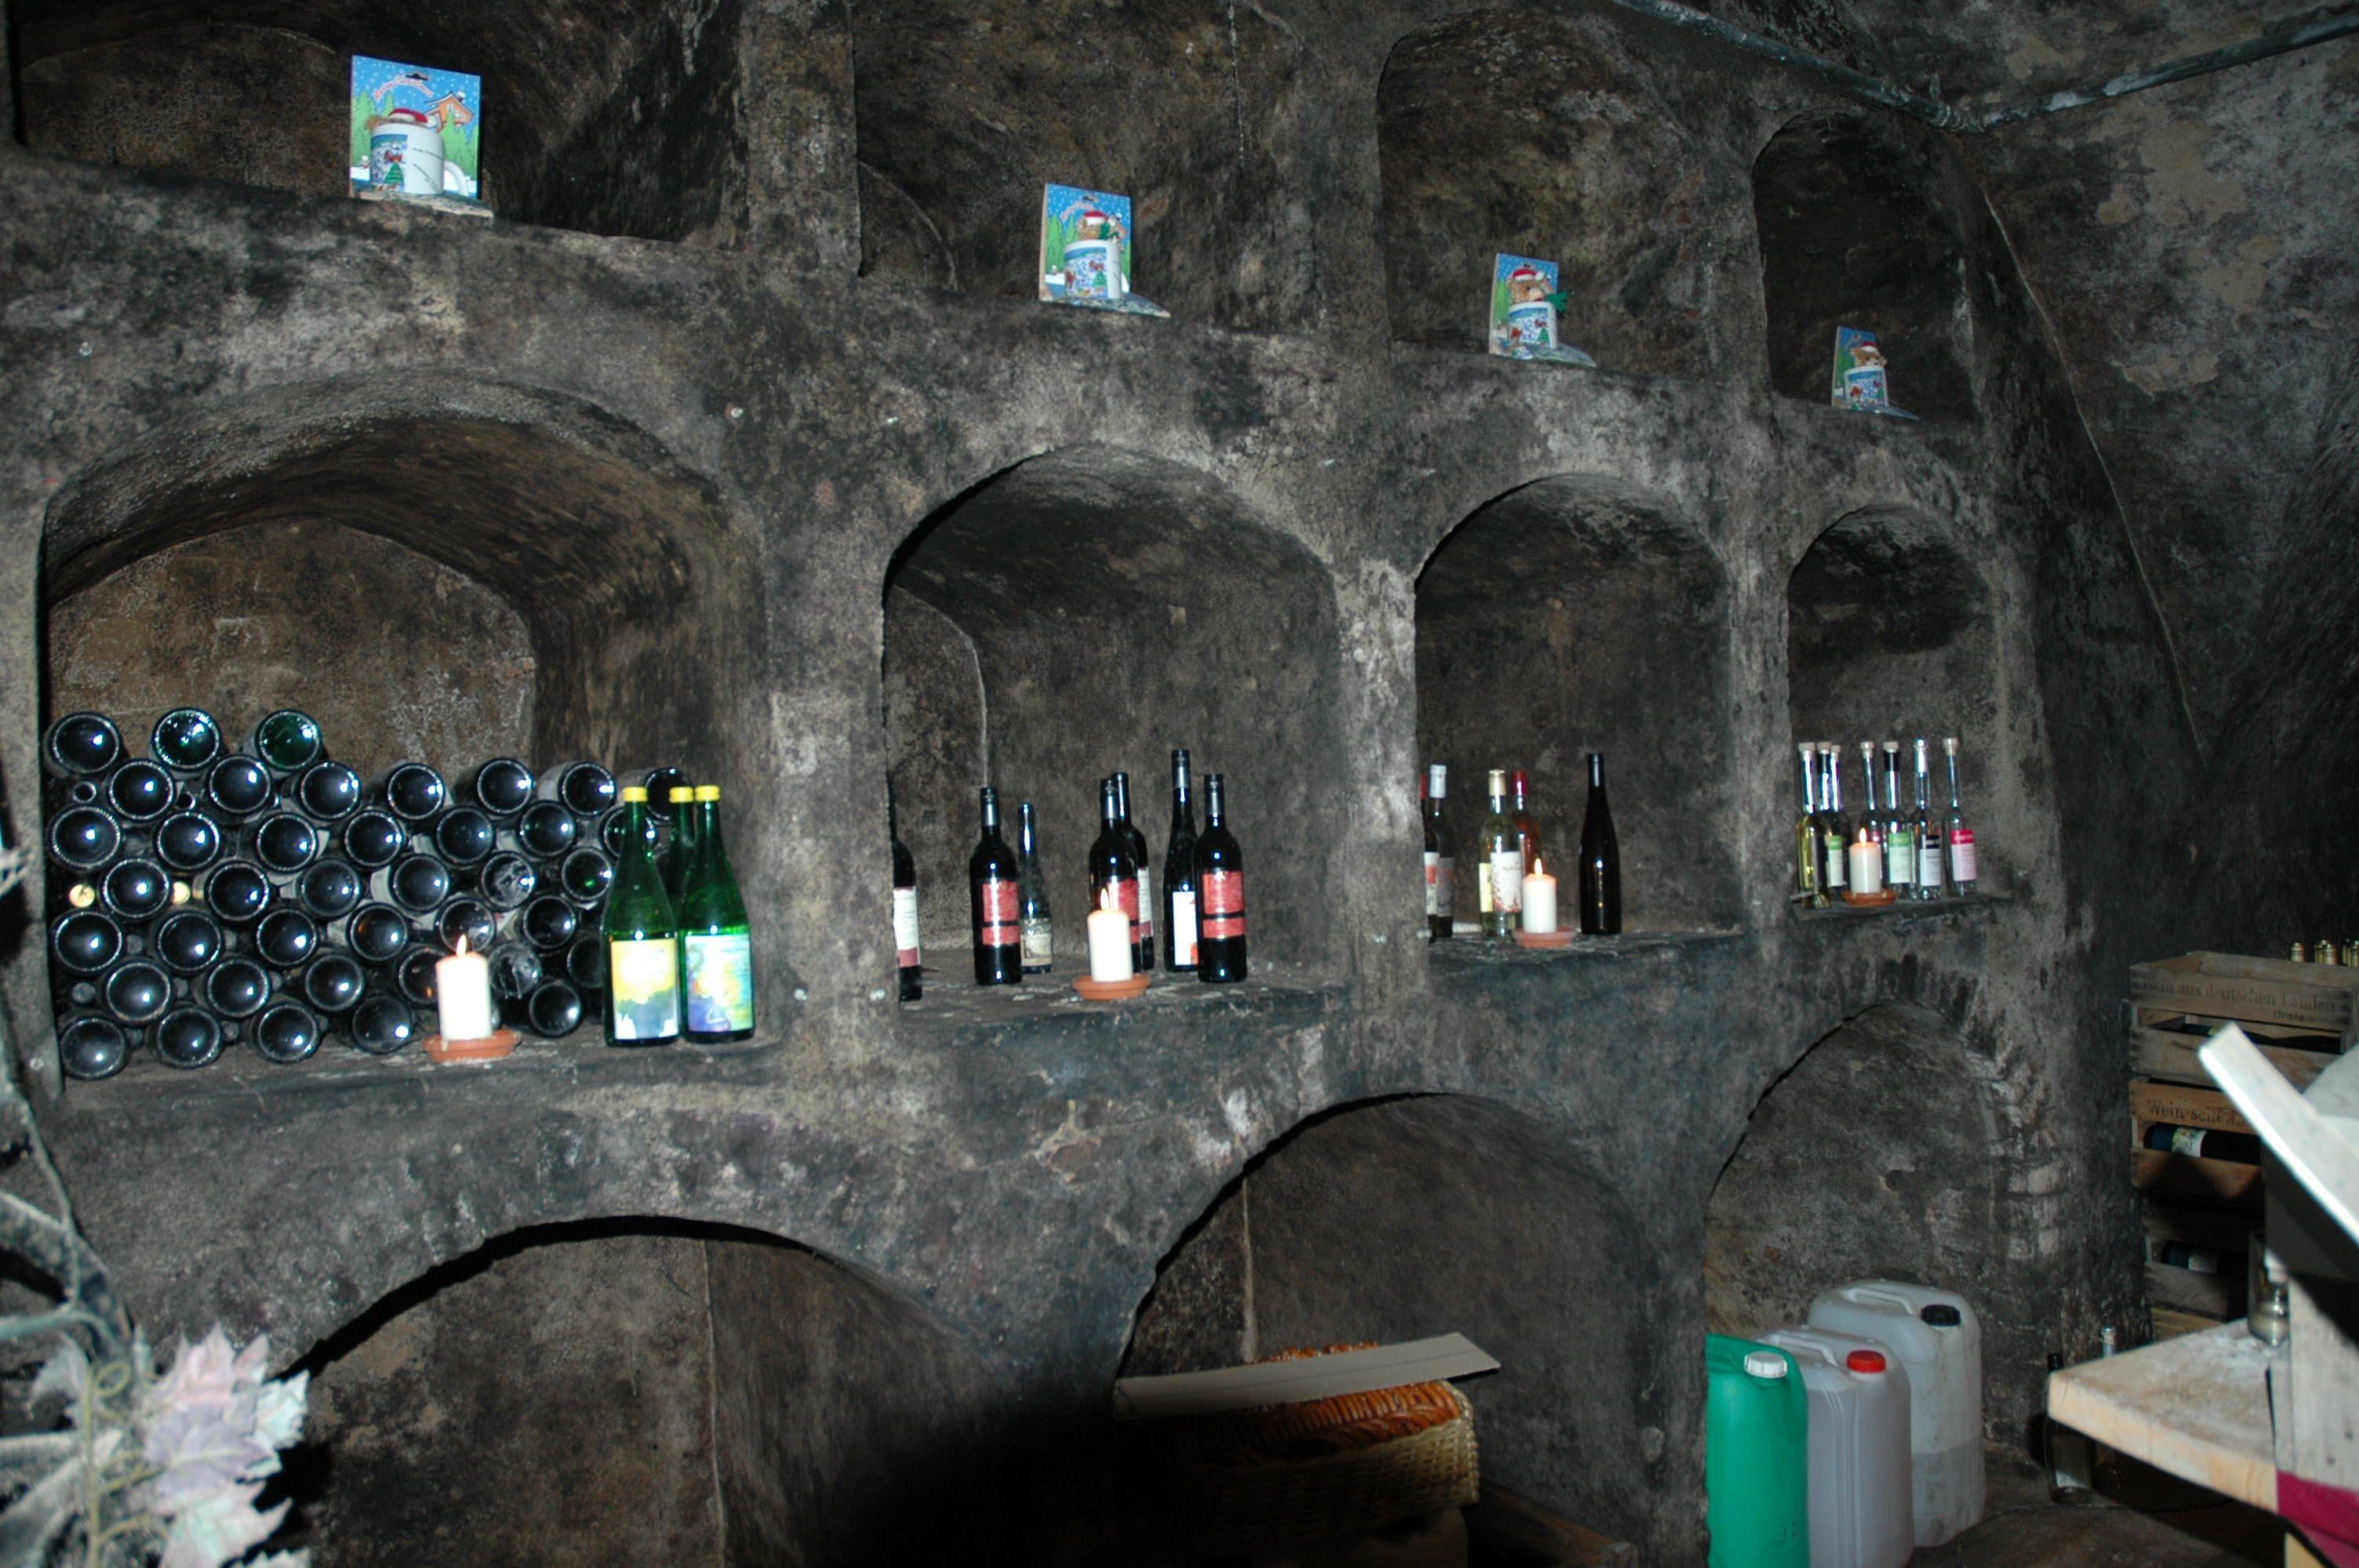 Adolf Storzel Wine Tastings In The Historical Bassenheimer Hof Rudesheim Am Rhein Germany Rhine River Cruise Rhine River River Cruises